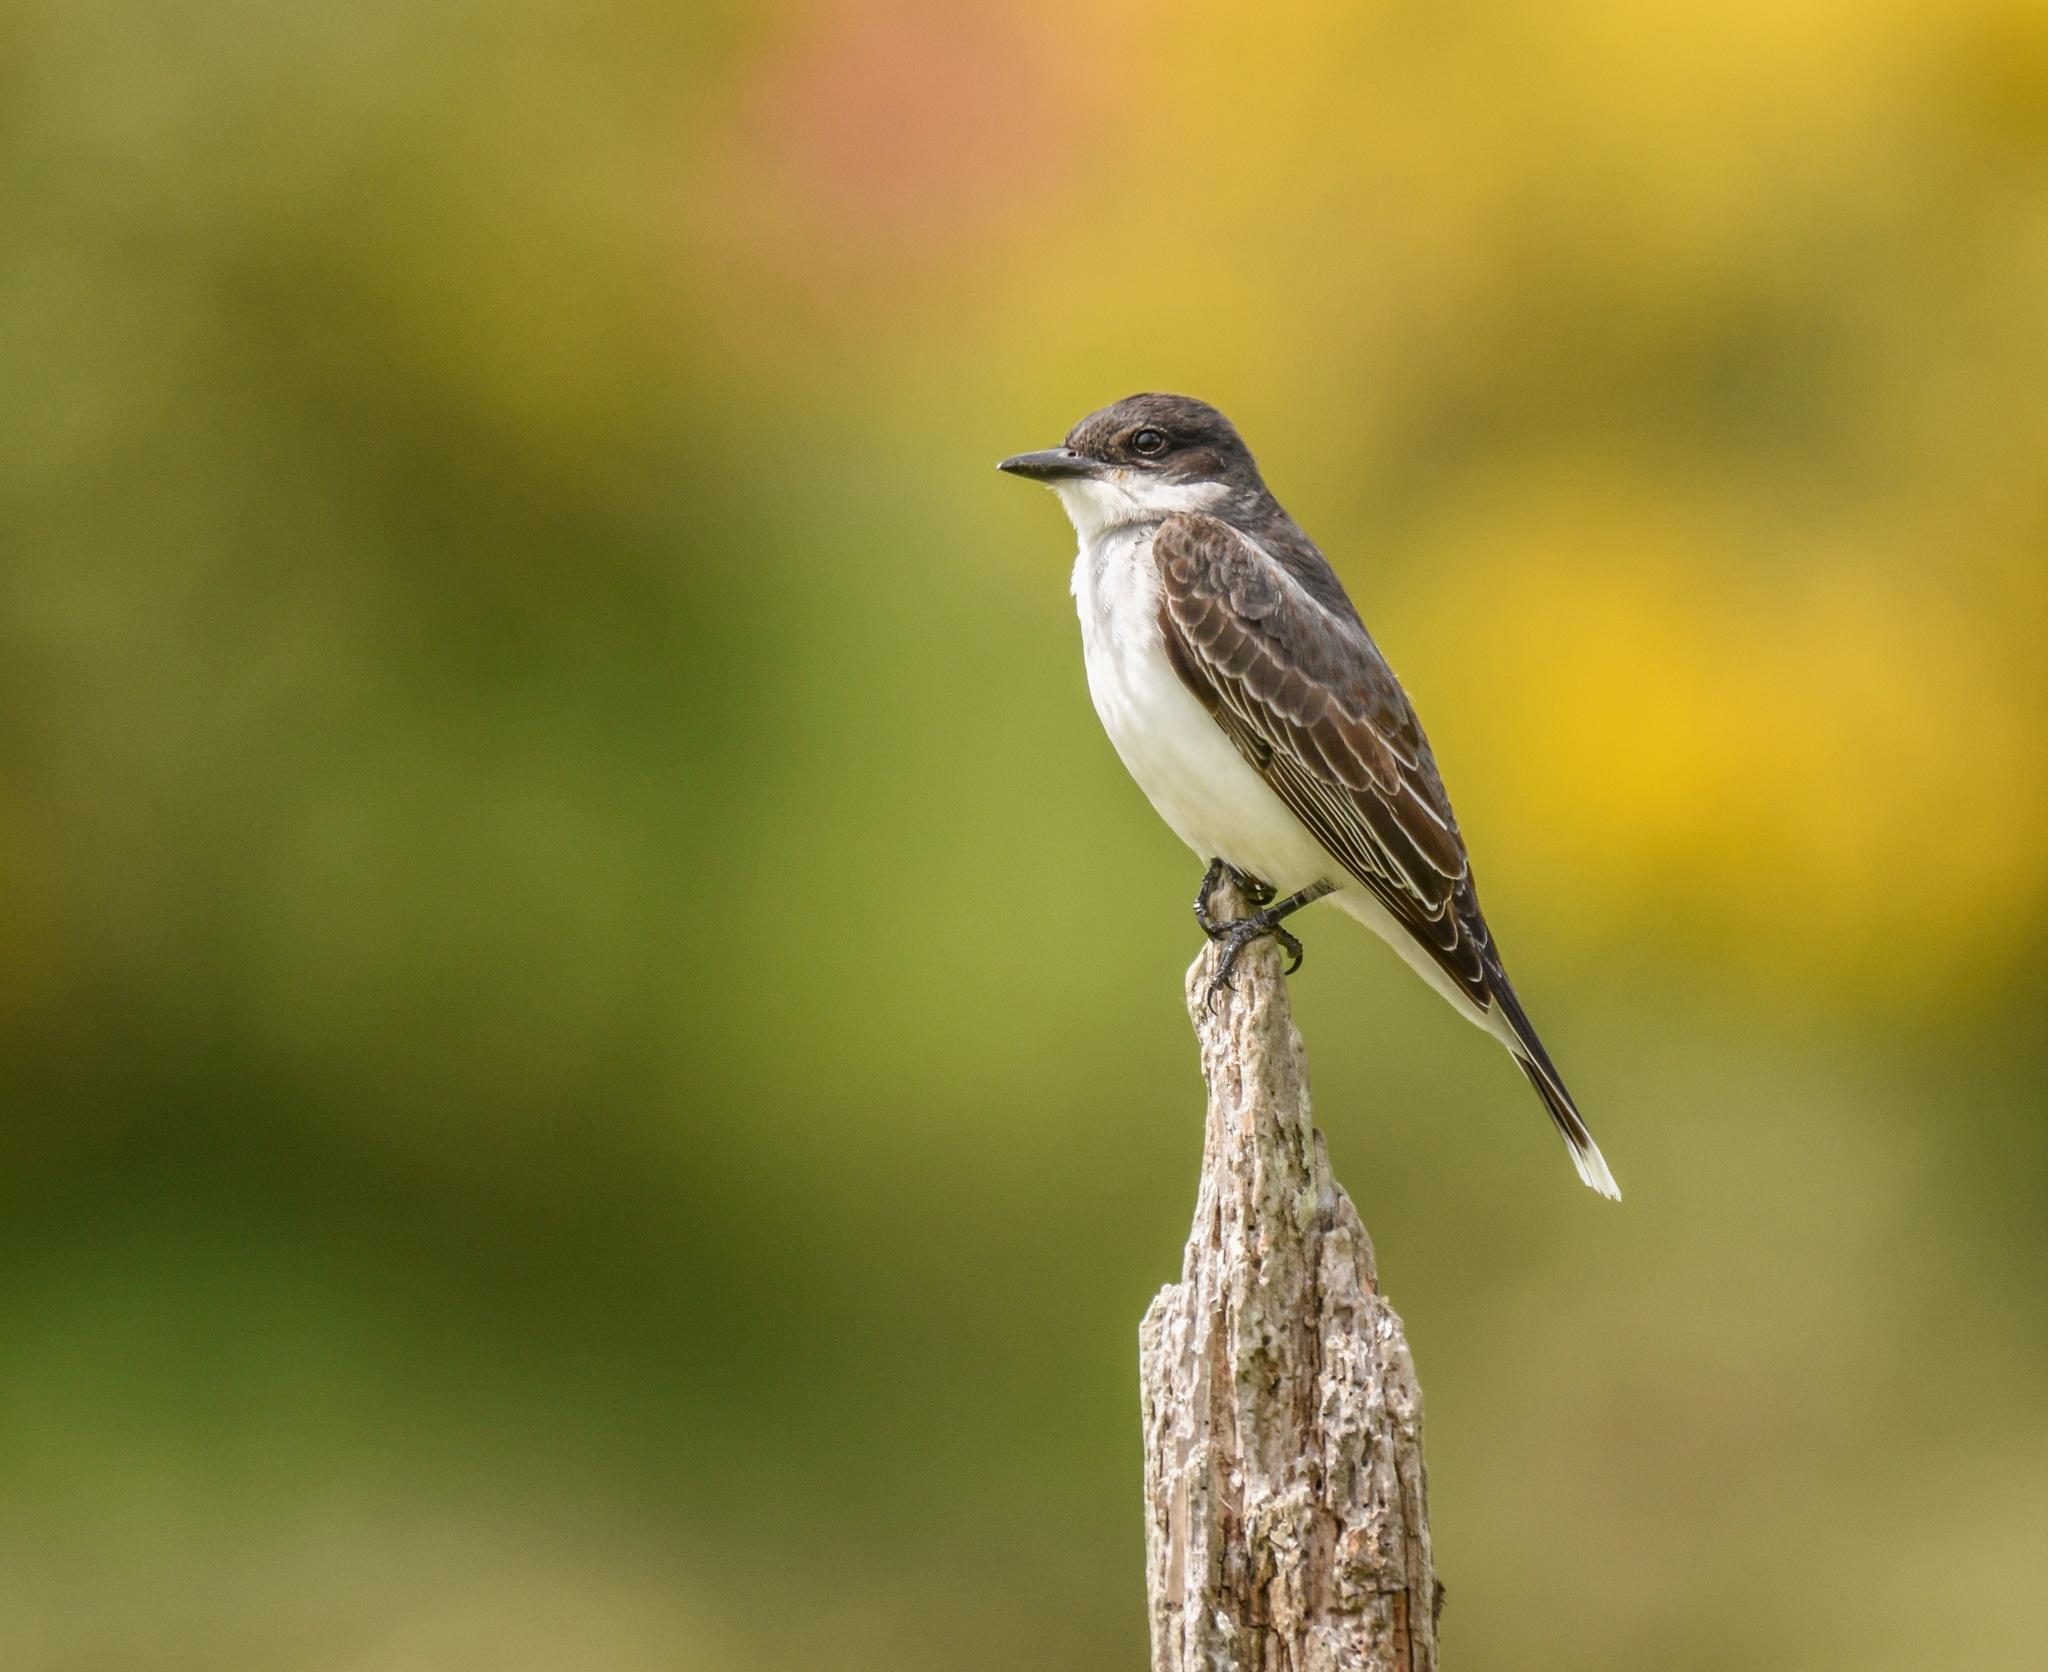 Eastern Kingbird by Robert Stenseth